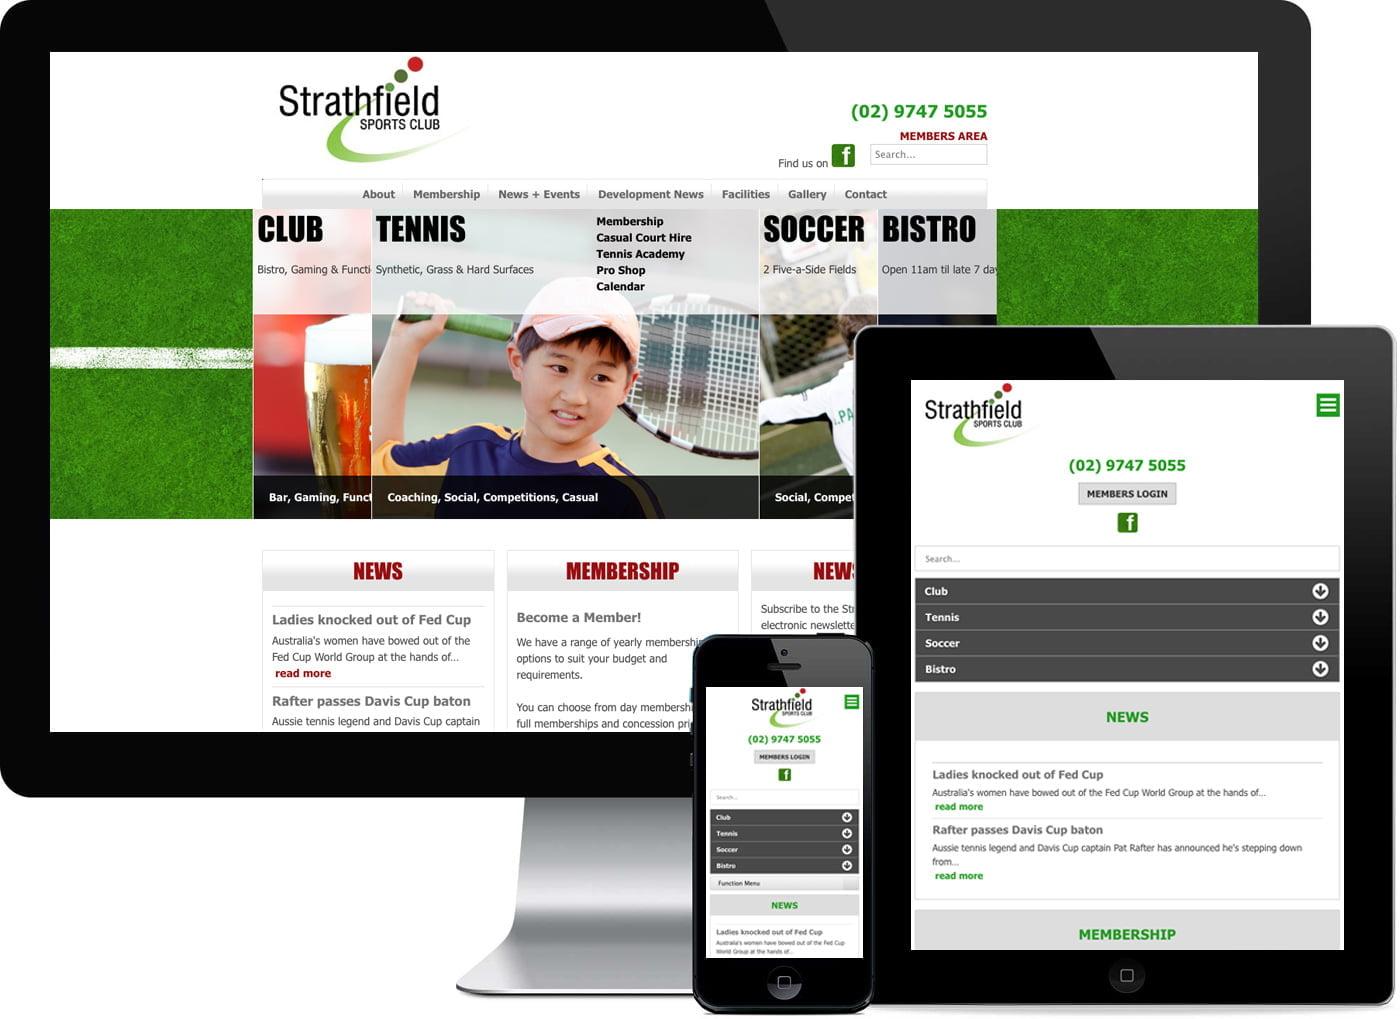 STRATHFIELD-SPORTS-CLUB